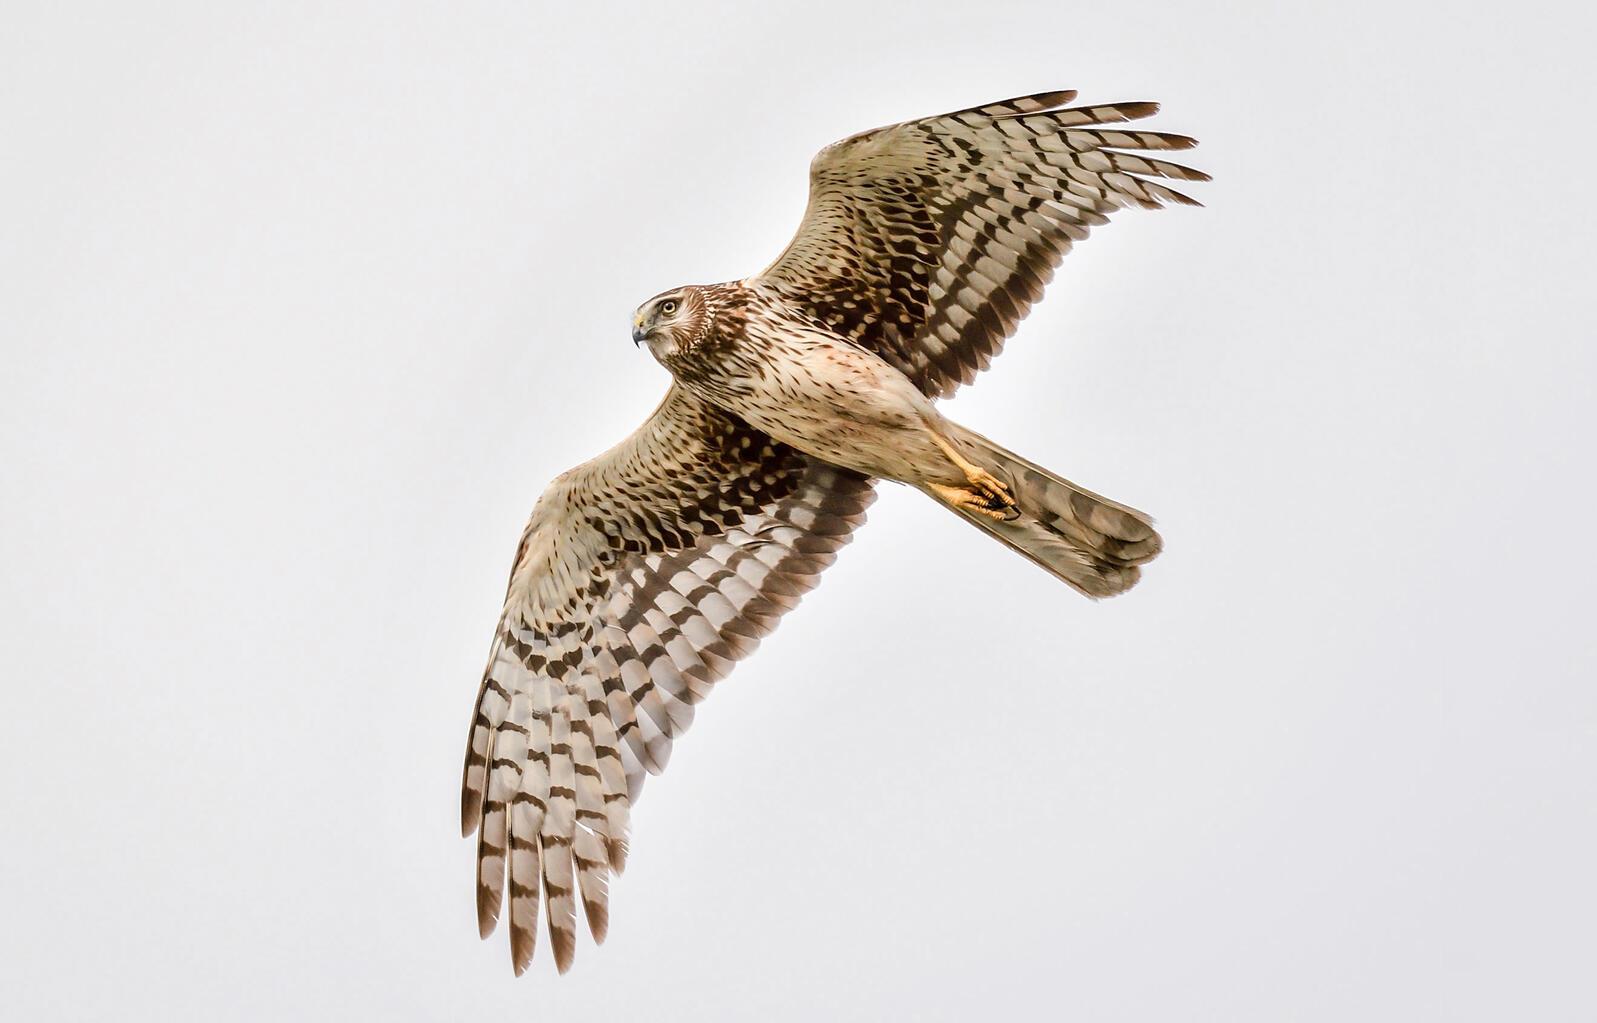 Northern Harrier. Brad Lewis/Audubon Photography Awards